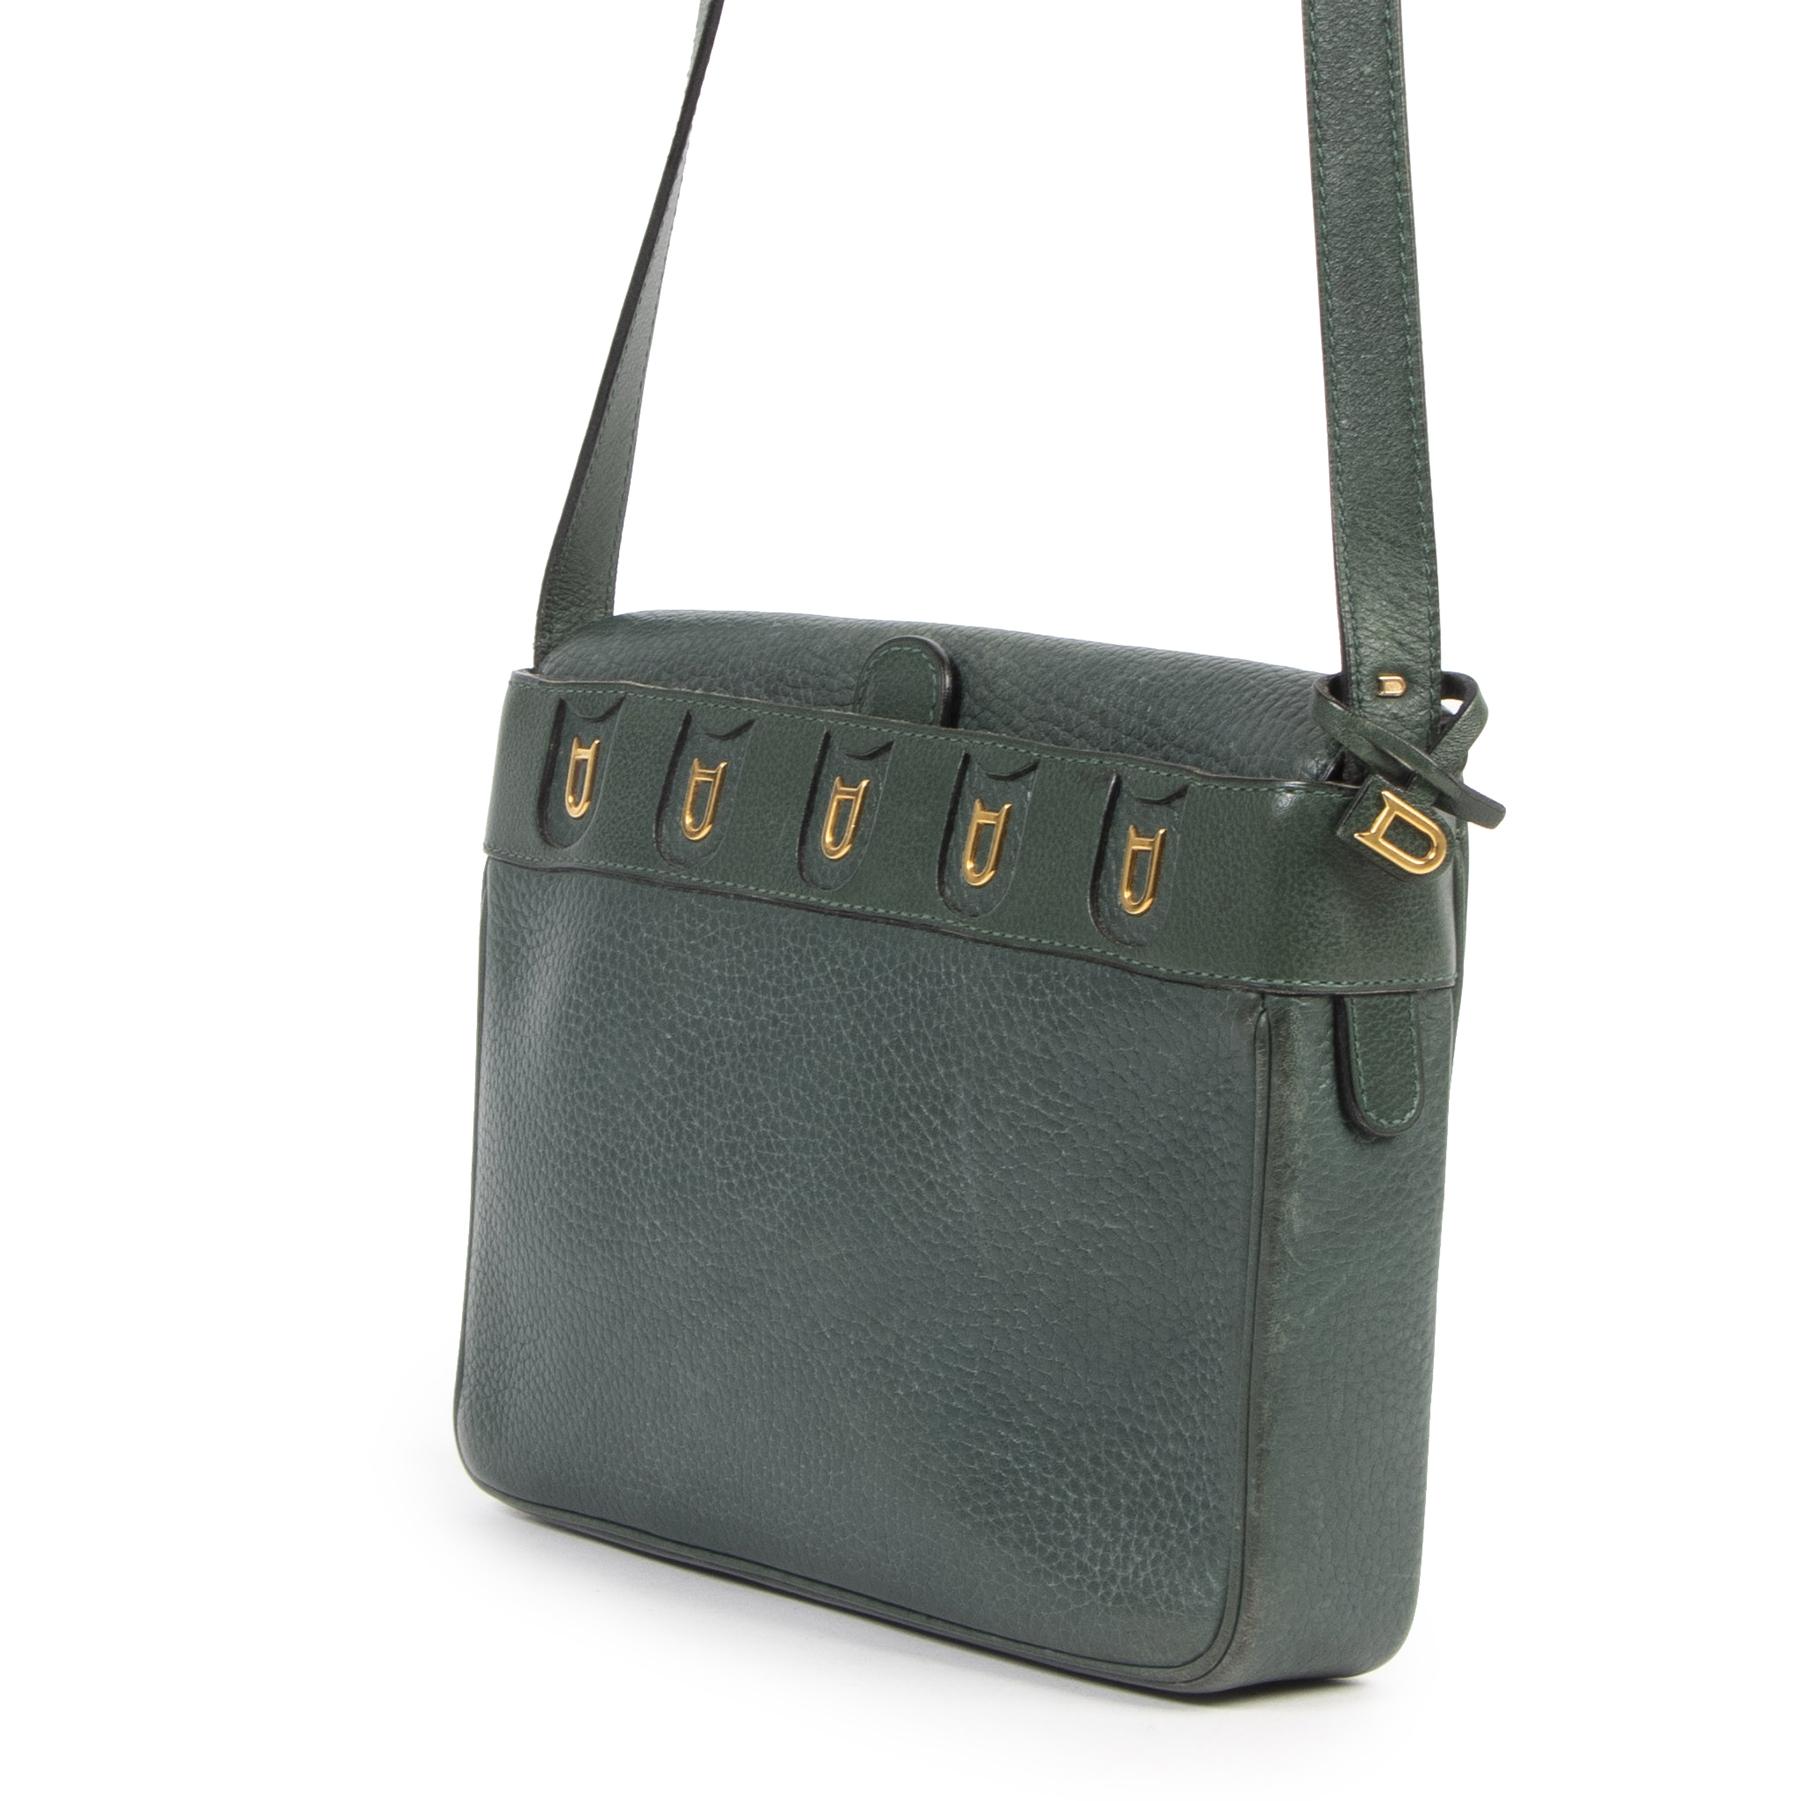 shop safe online Delvaux Green D Crossbody Bag